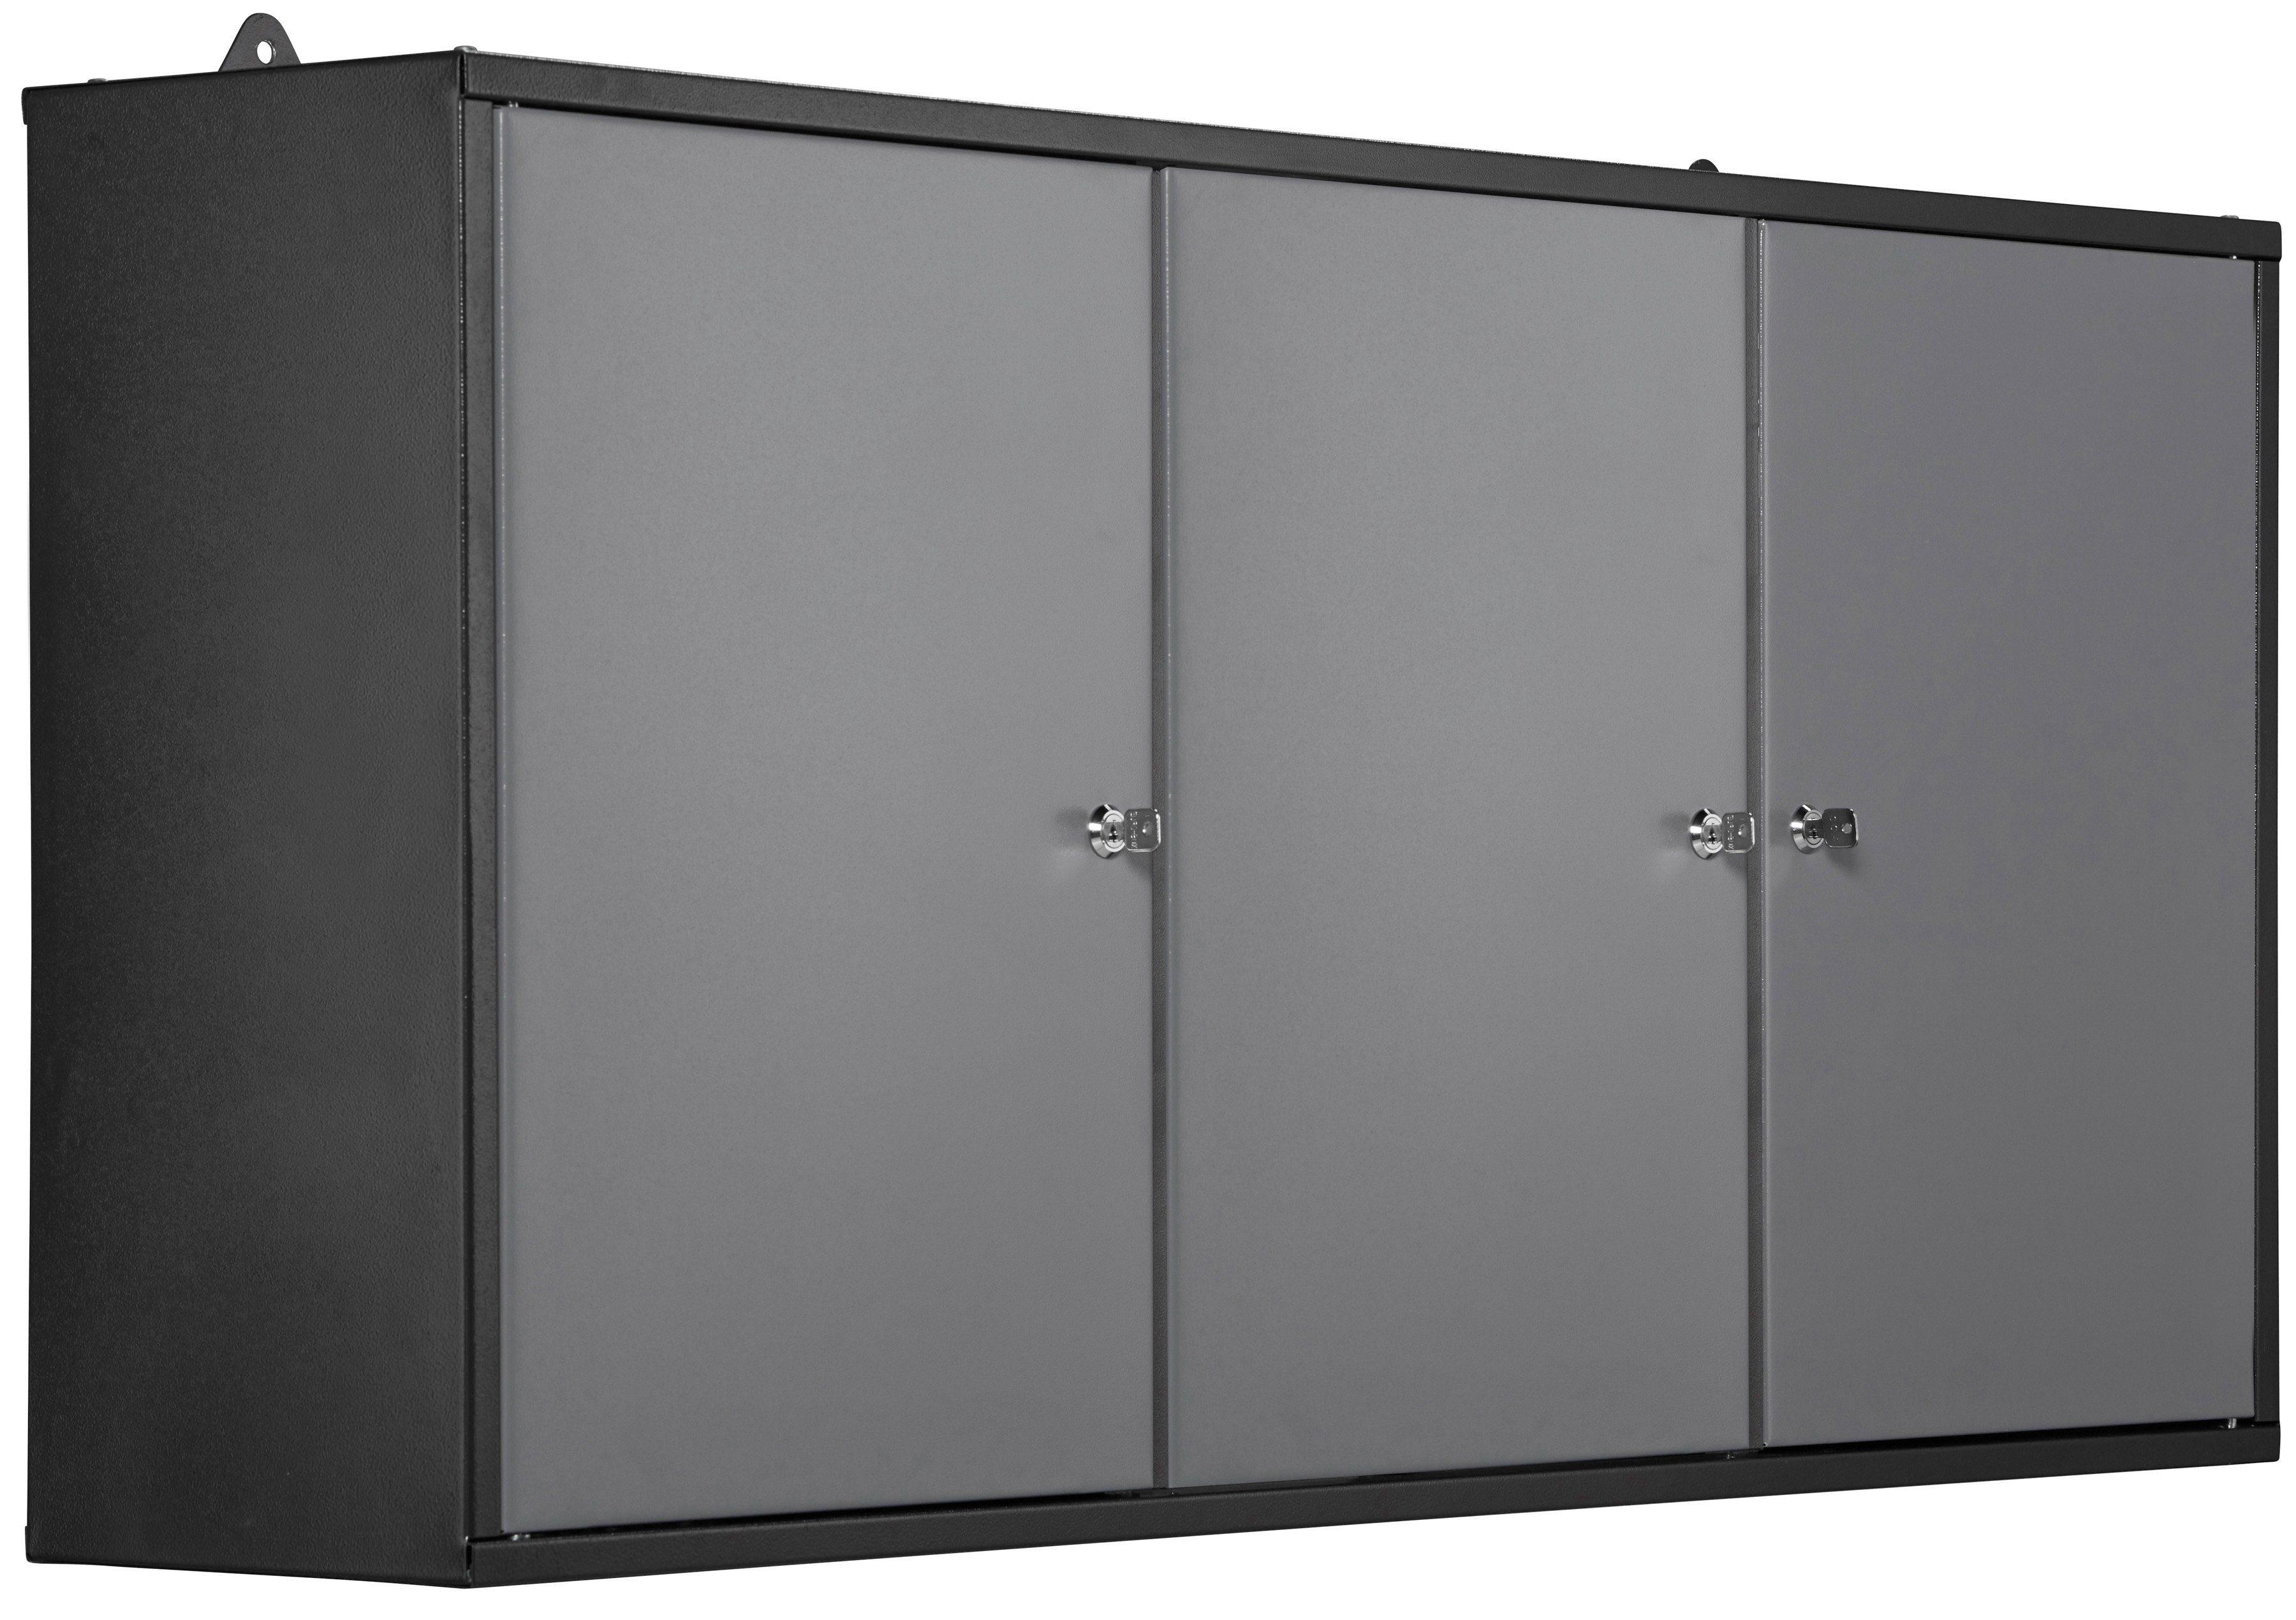 werkzeug h ngeschrank metall zd66 hitoiro. Black Bedroom Furniture Sets. Home Design Ideas